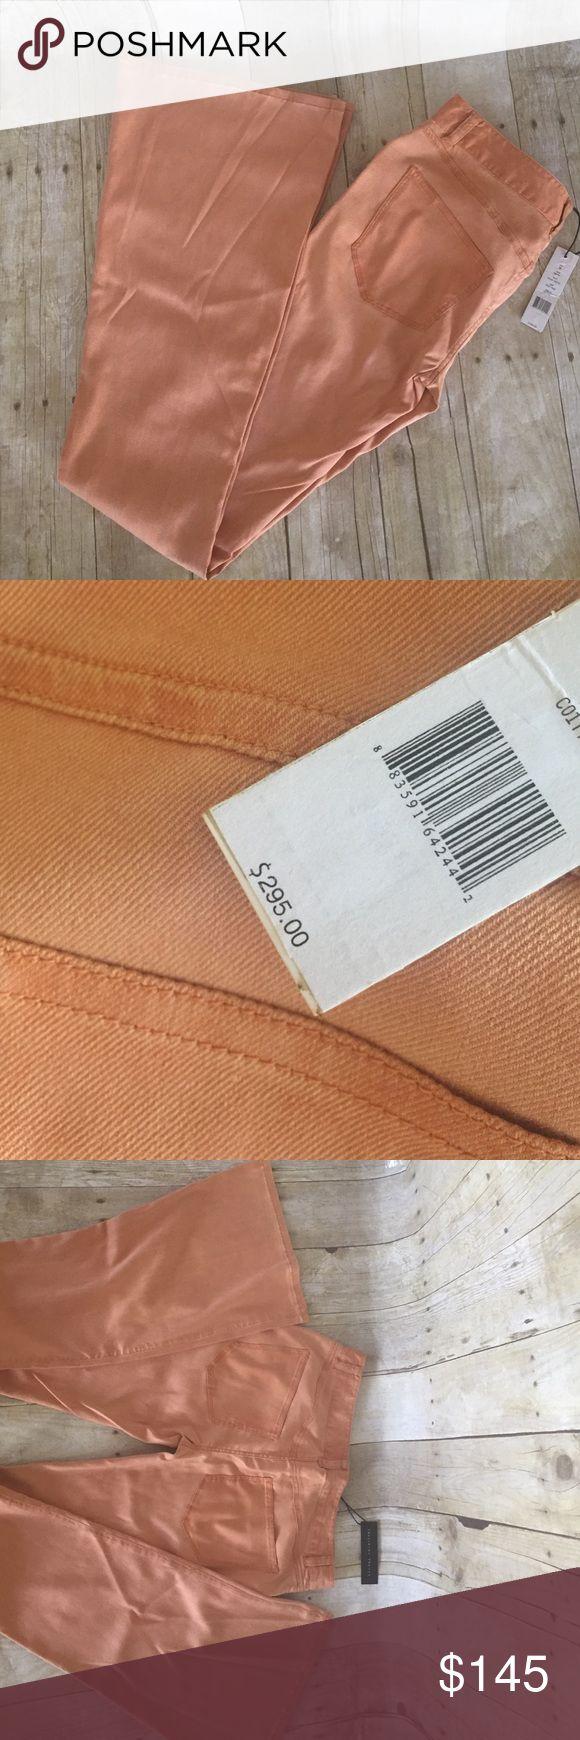 THEORY pantana peach jeans NWT size 26 THEORY peach boho chic flare NWT size 26 jeans.  Very thin. Inseam 34 Theysken's Theory Jeans Flare & Wide Leg